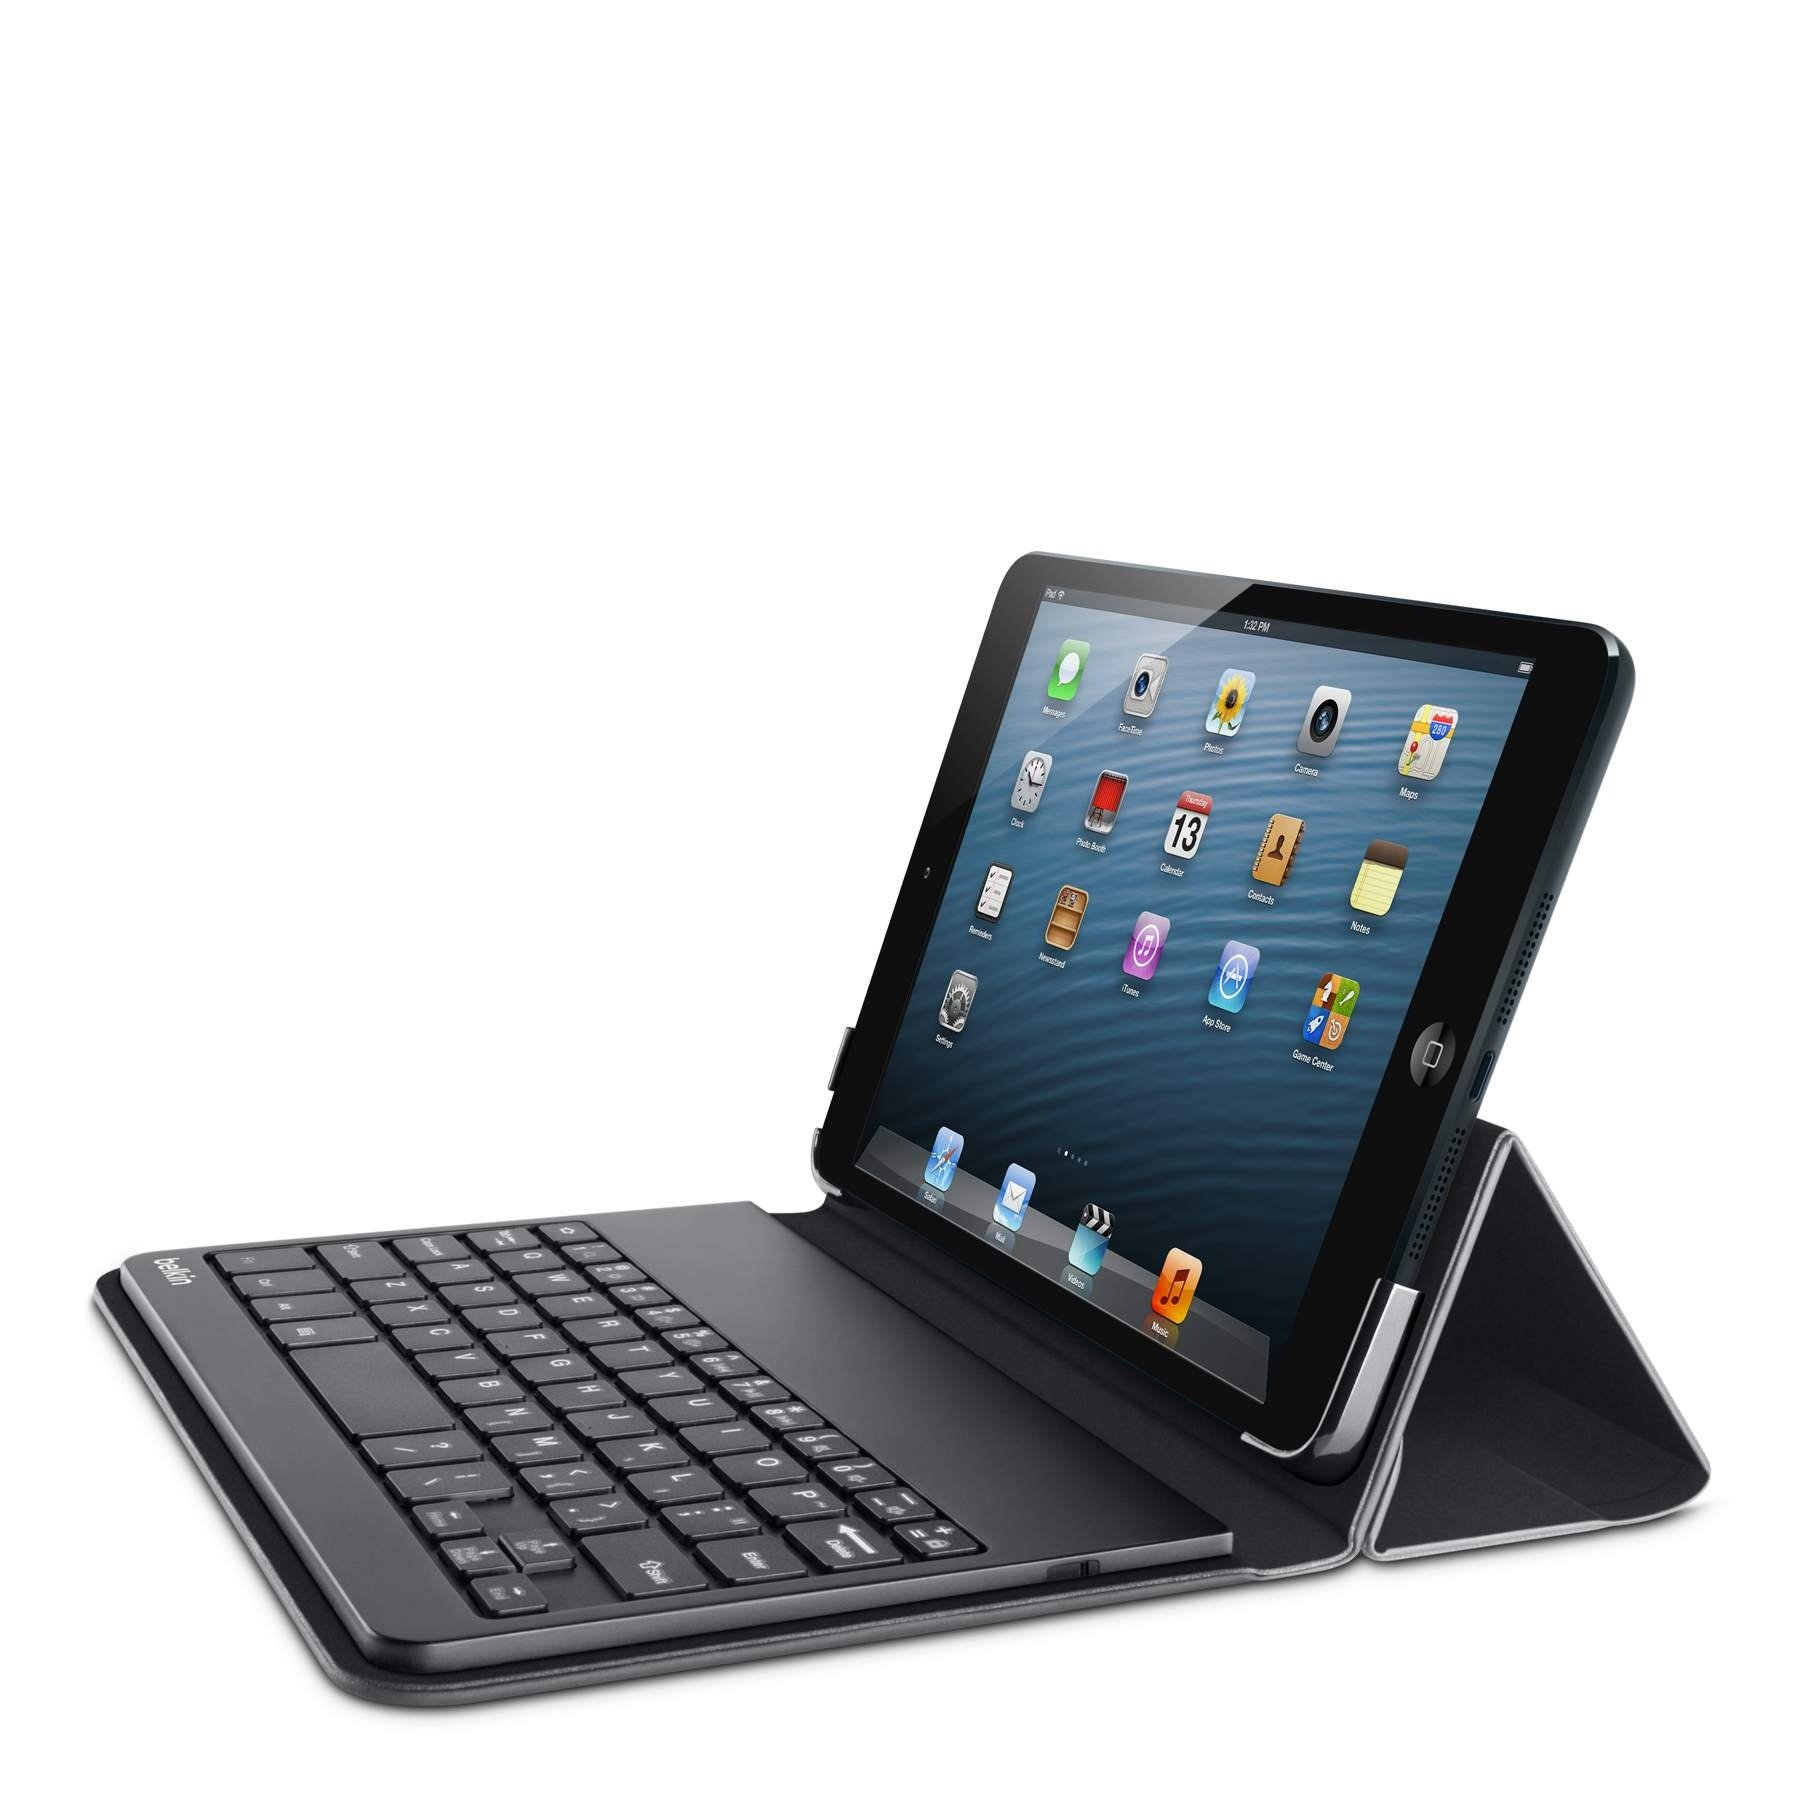 Belkin QODE Portable Bluetooth Keyboard and Case for iPad mini 3, iPad mini 2 with Retina Display and iPad mini  (Black) by Belkin